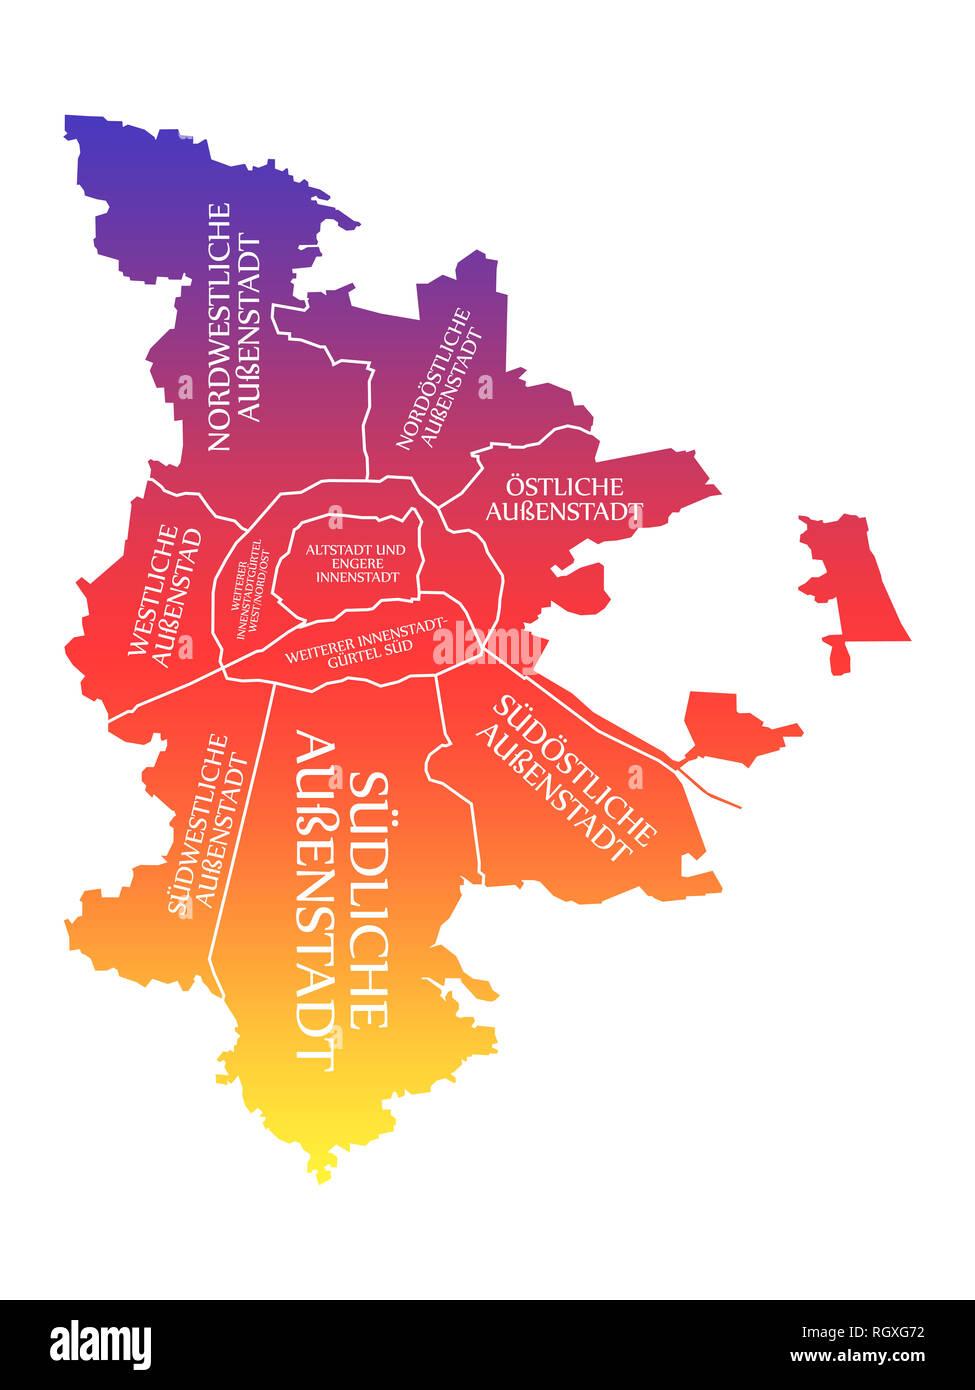 Nürnberg Karte Deutschland.Stadt Nürnberg Karte Deutschland De Beschriftet Rainbow Farbige